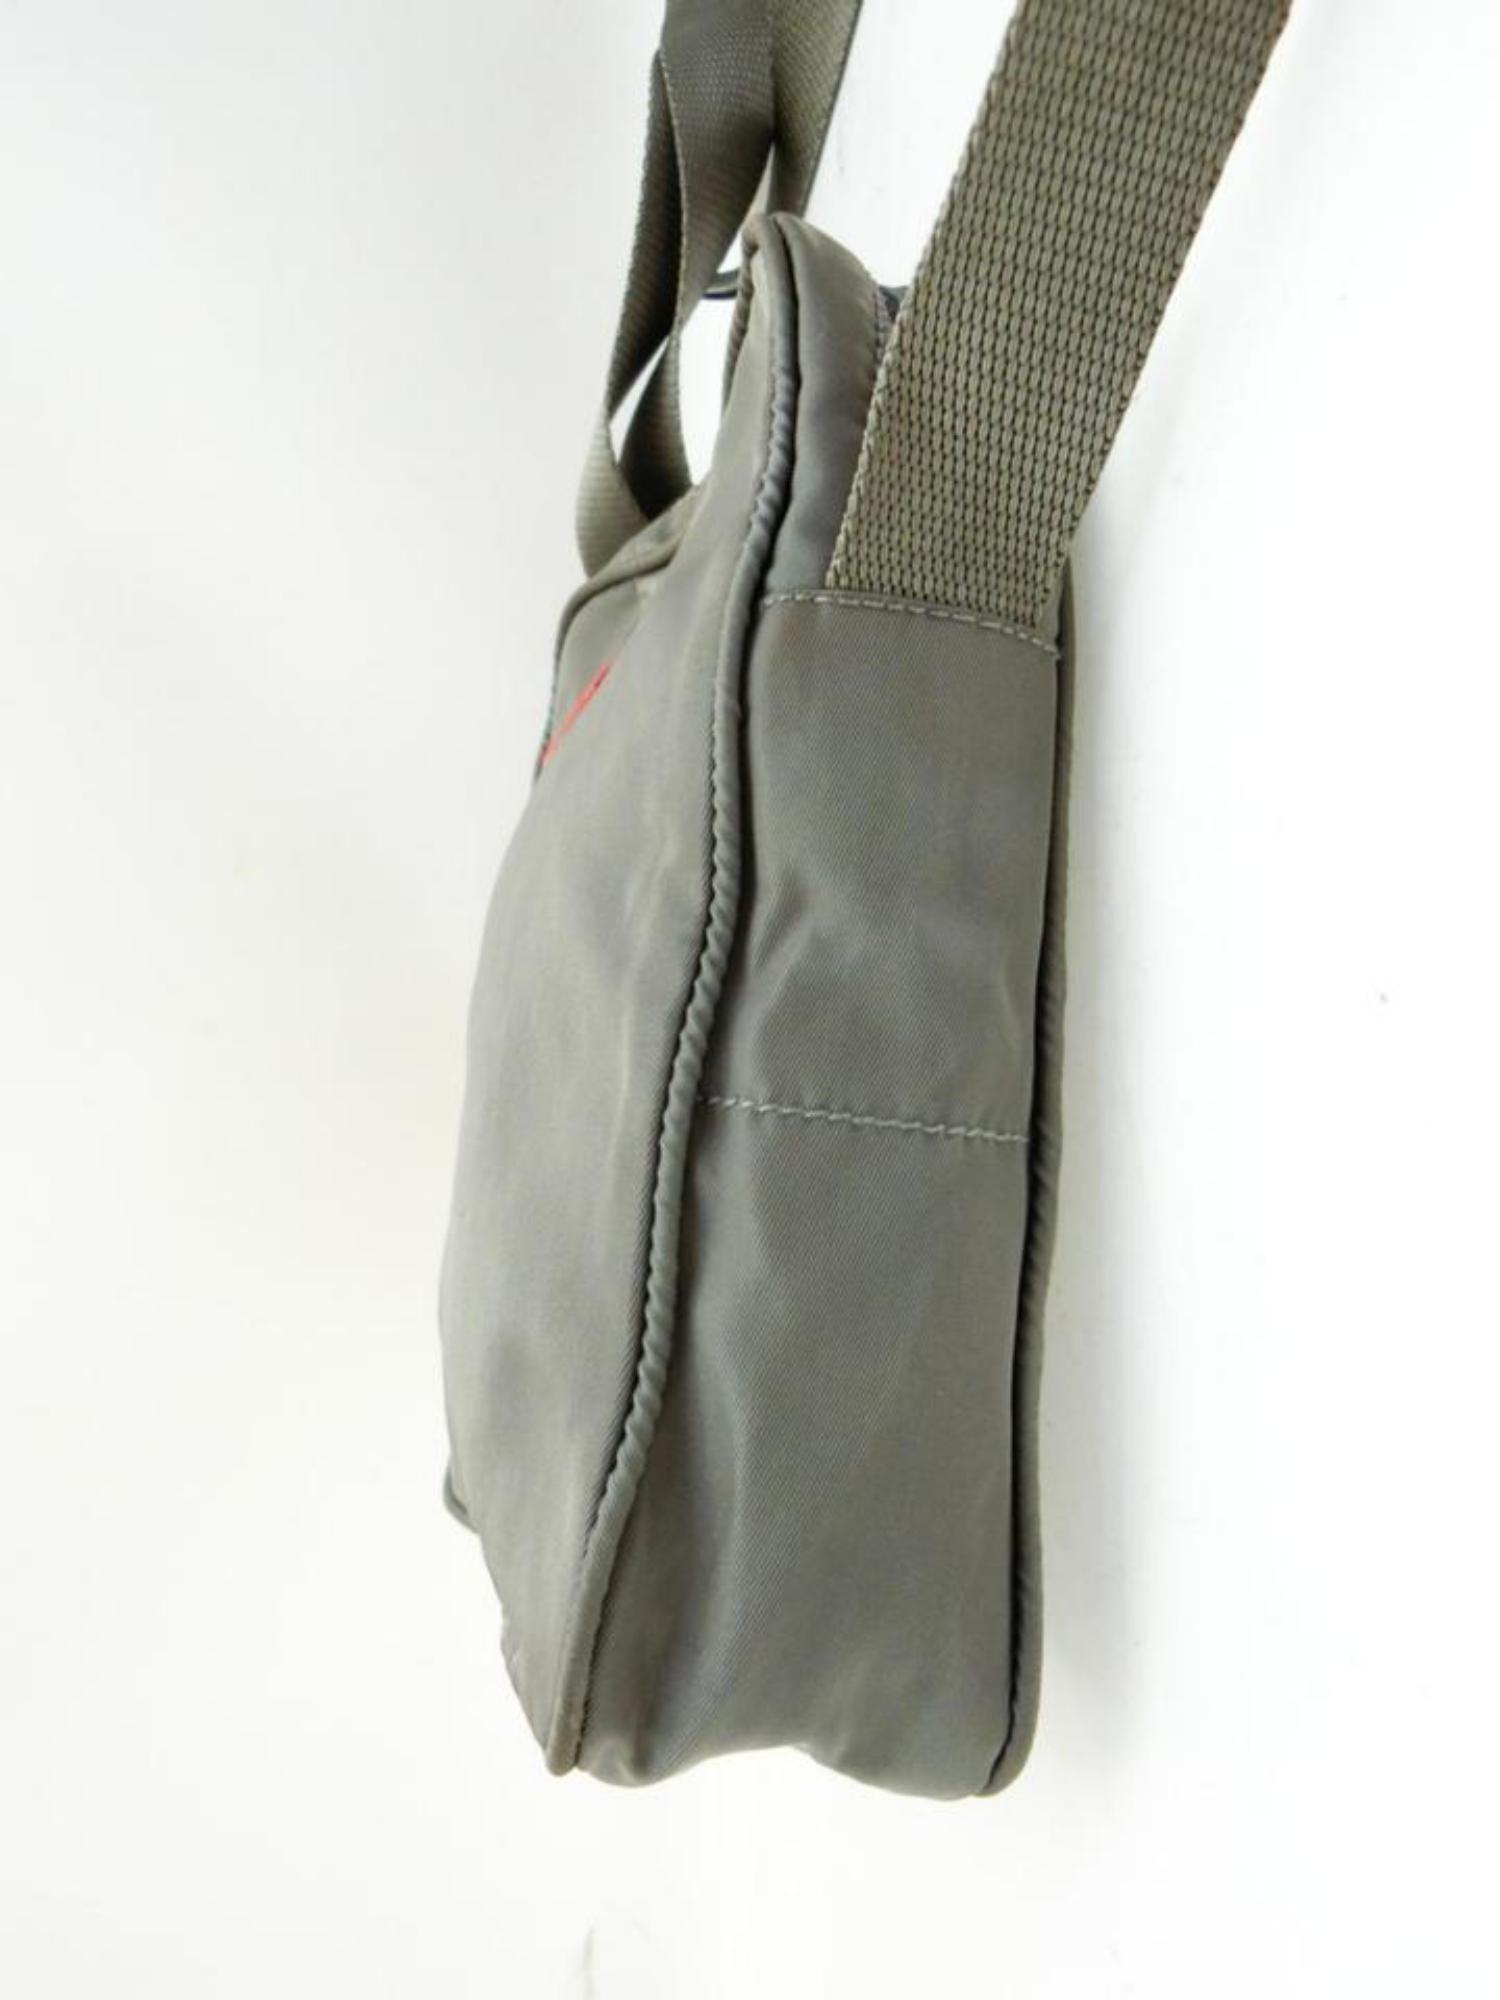 47b5e64f383b Prada Sports Tessuto Vela Mini Messenger 232179 Grey Nylon Cross Body Bag  For Sale at 1stdibs